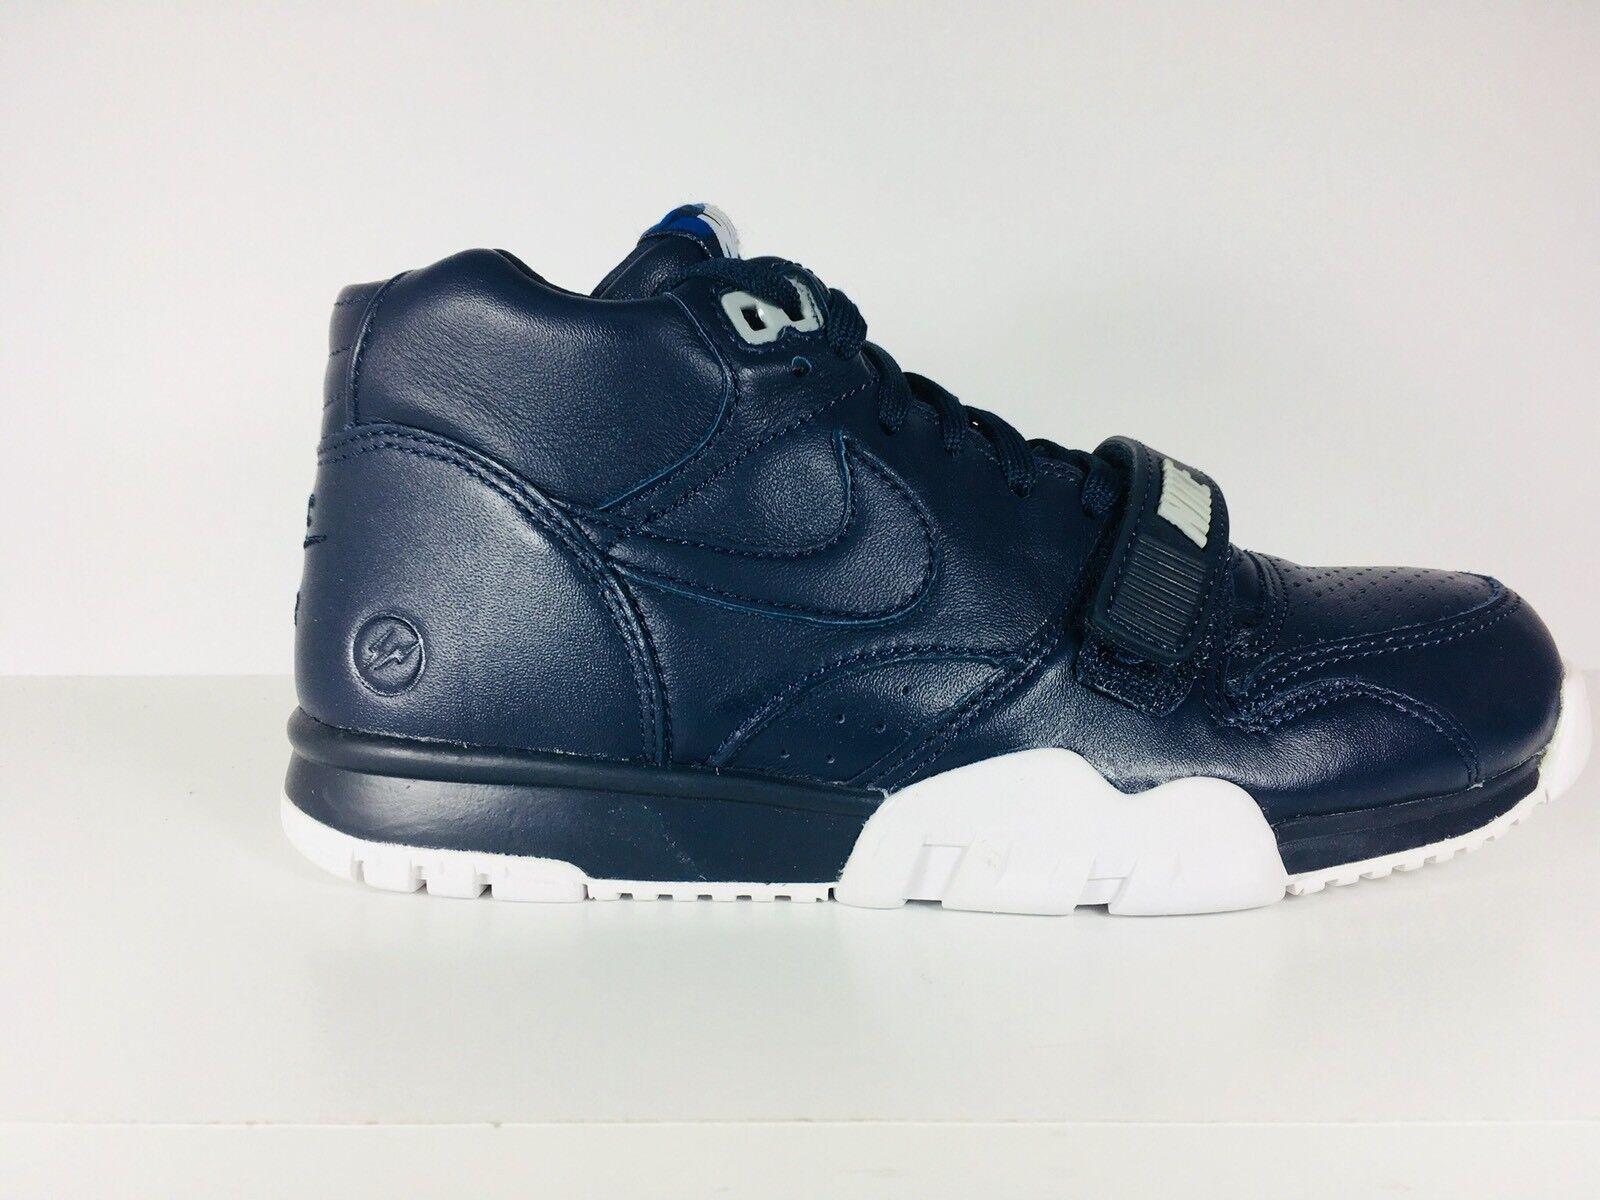 Nike Fragment Obsidian Air Air Obsidian Trainer Blue Mens 806942 441 SIze 6  460728 09f5bc4cb